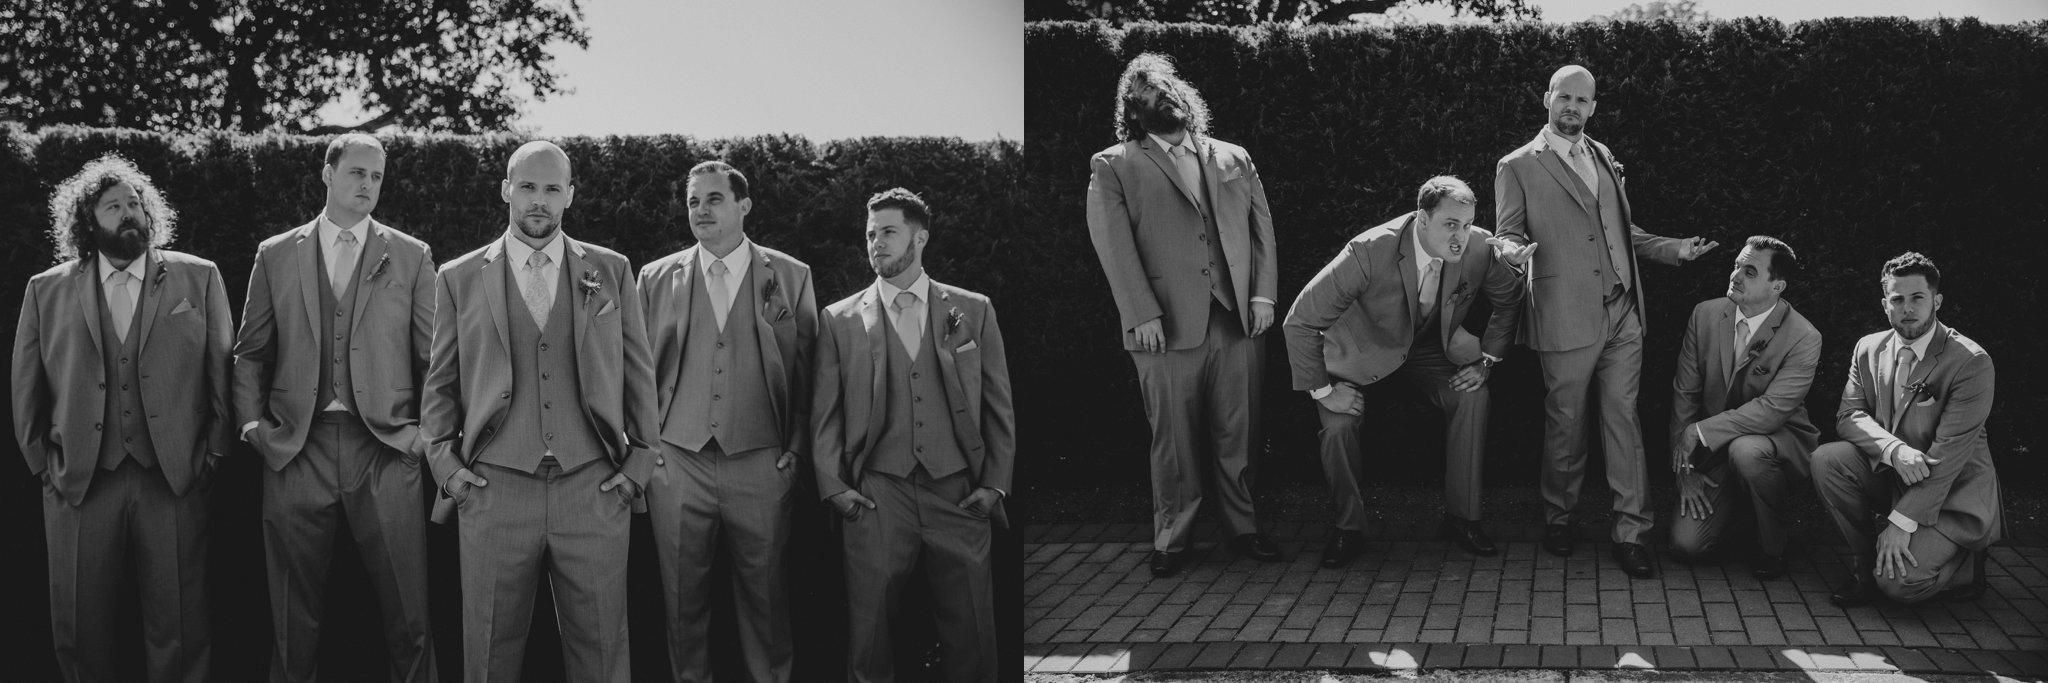 hollywood-school-house-wedding-seattle-photographer-caitlyn-nikula-2.jpg